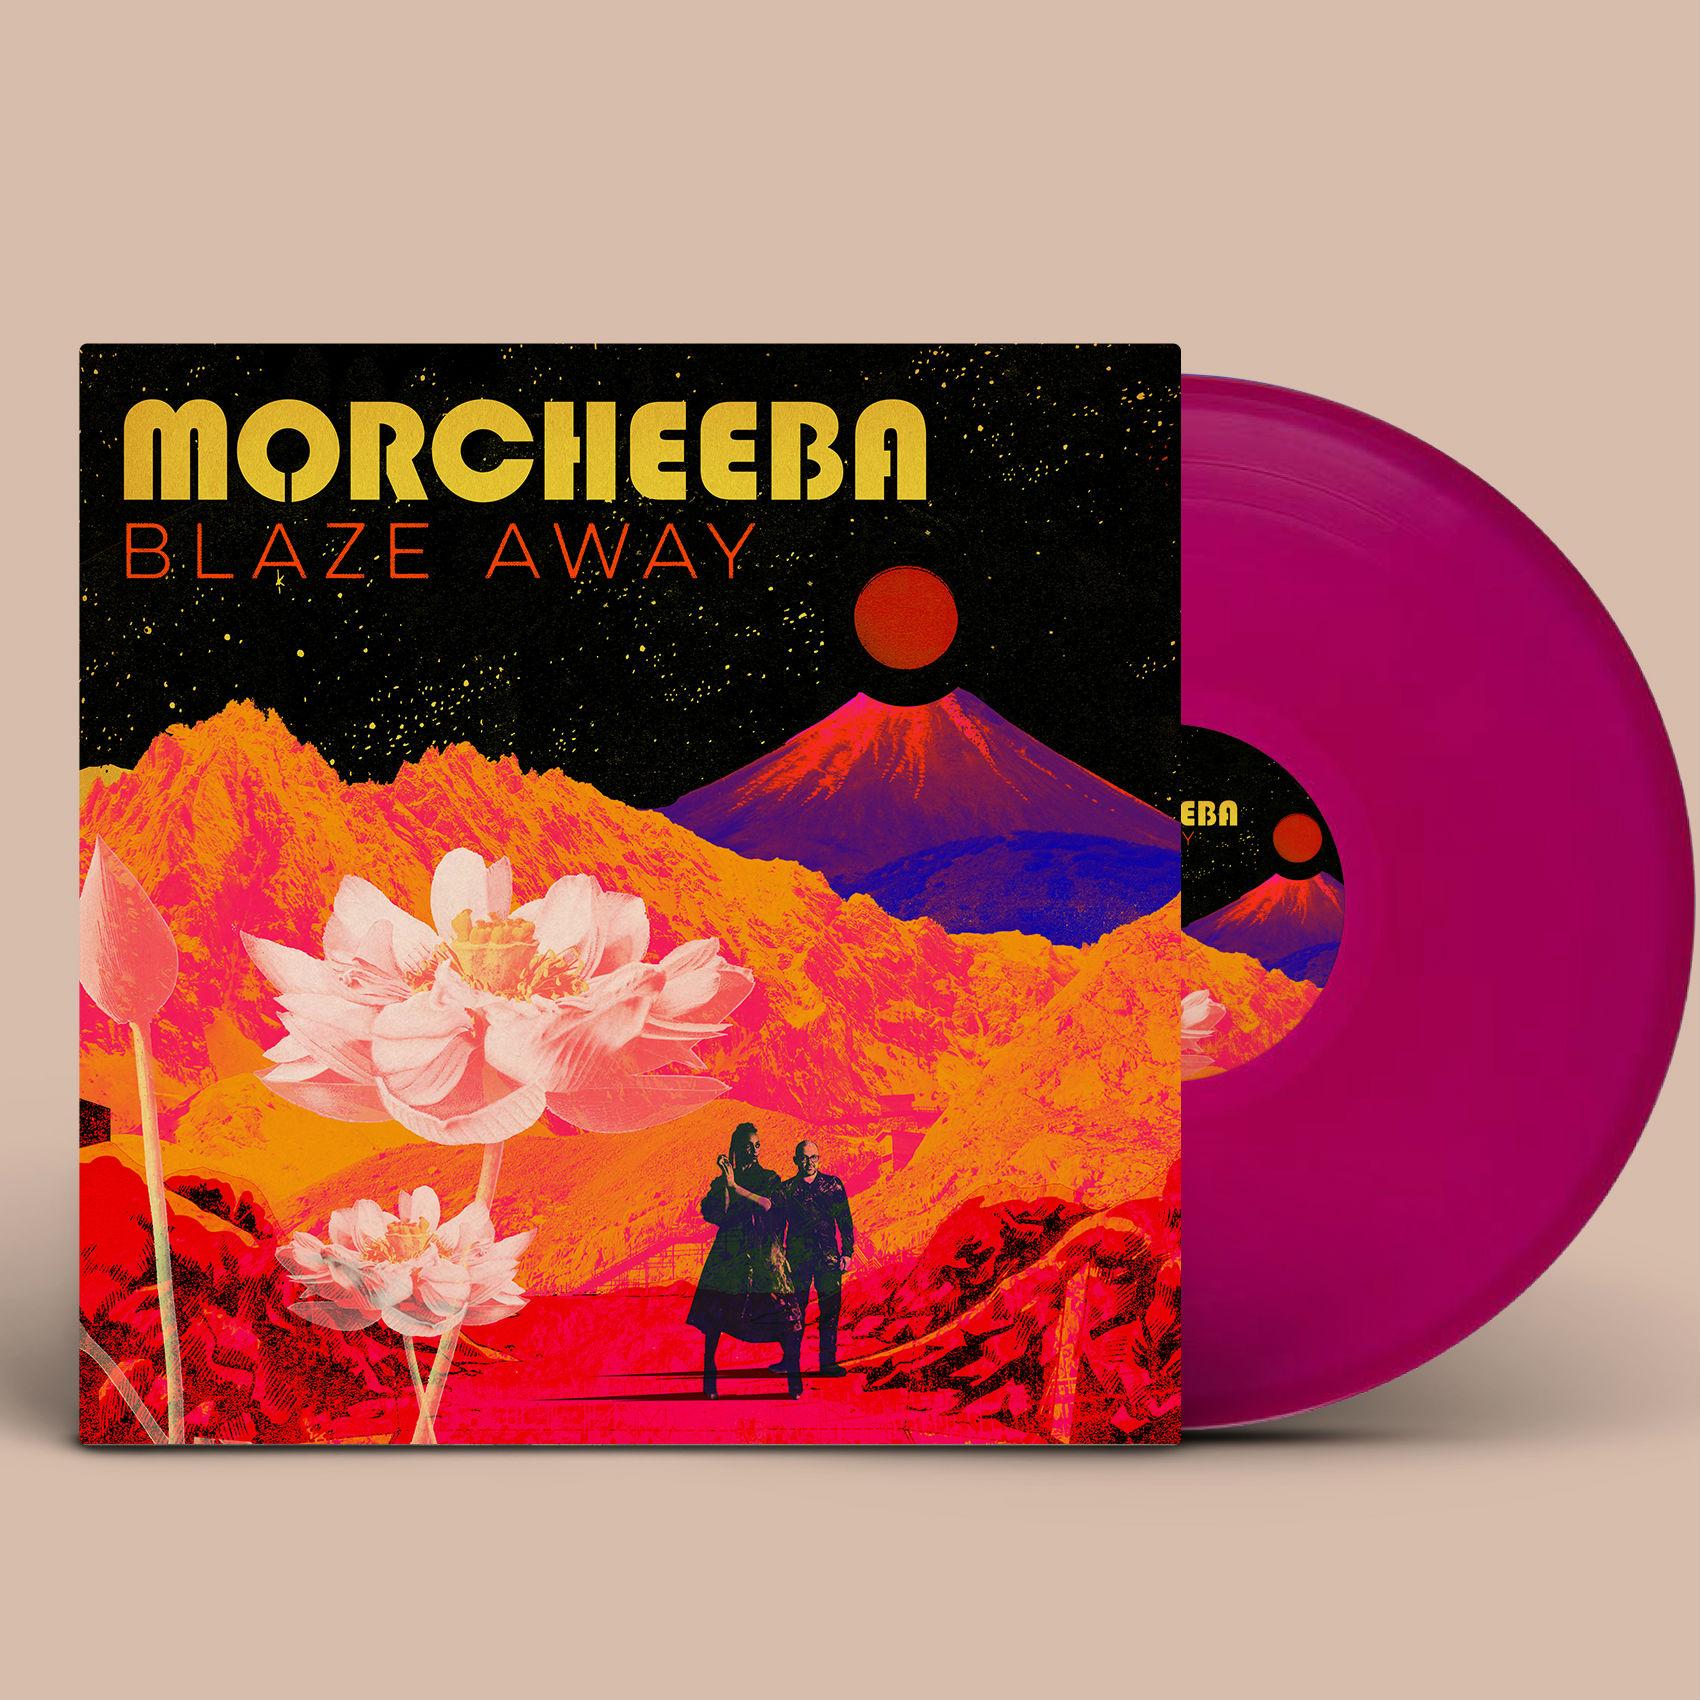 Blaze Away (Ltd Edition Magenta Vinyl) - Morcheeba